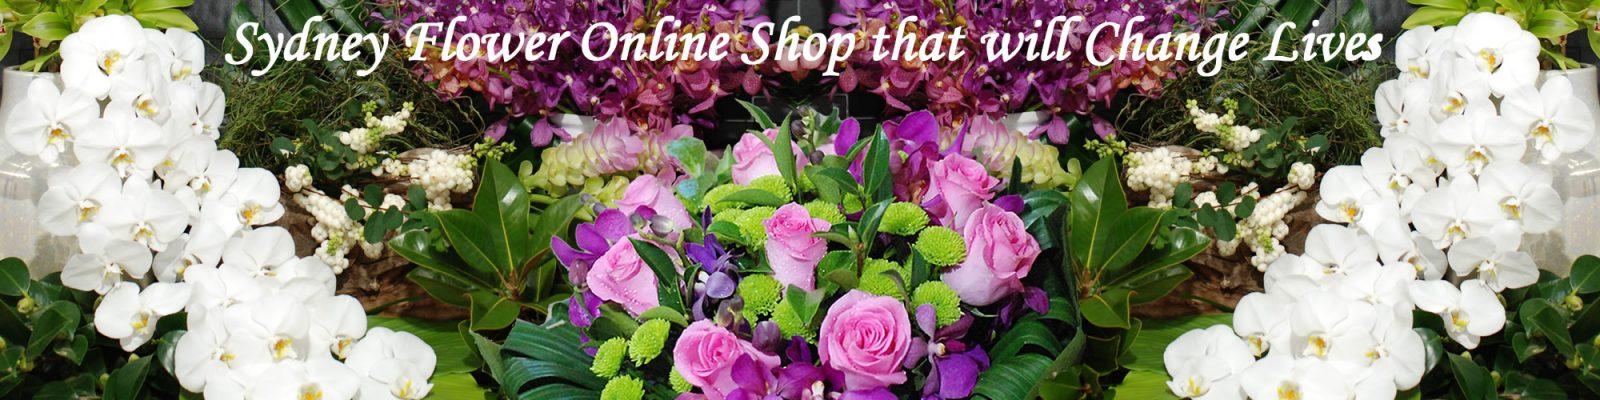 Angkorflowers - flower delivery sydney wide